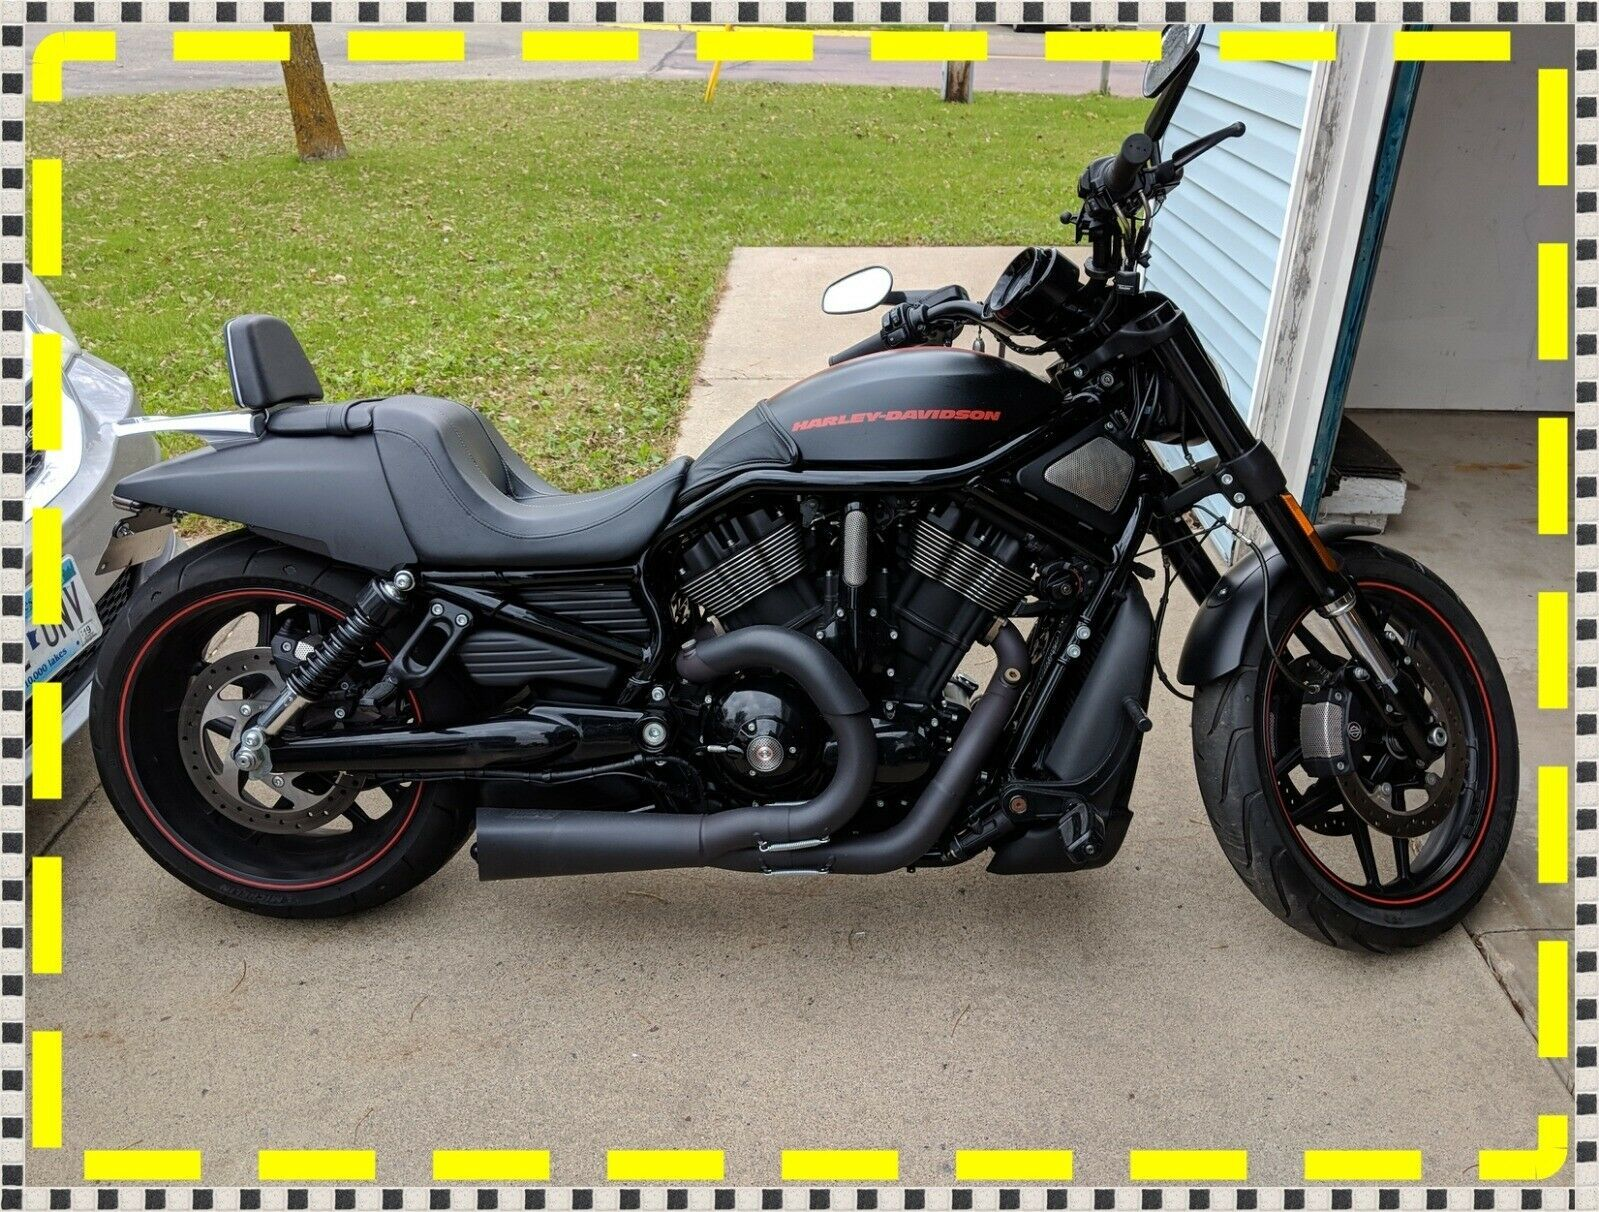 2015 Harley Davidson V Rod 2015 Night Rod Special Harley Davidson V Rod Harley Davidson Harley